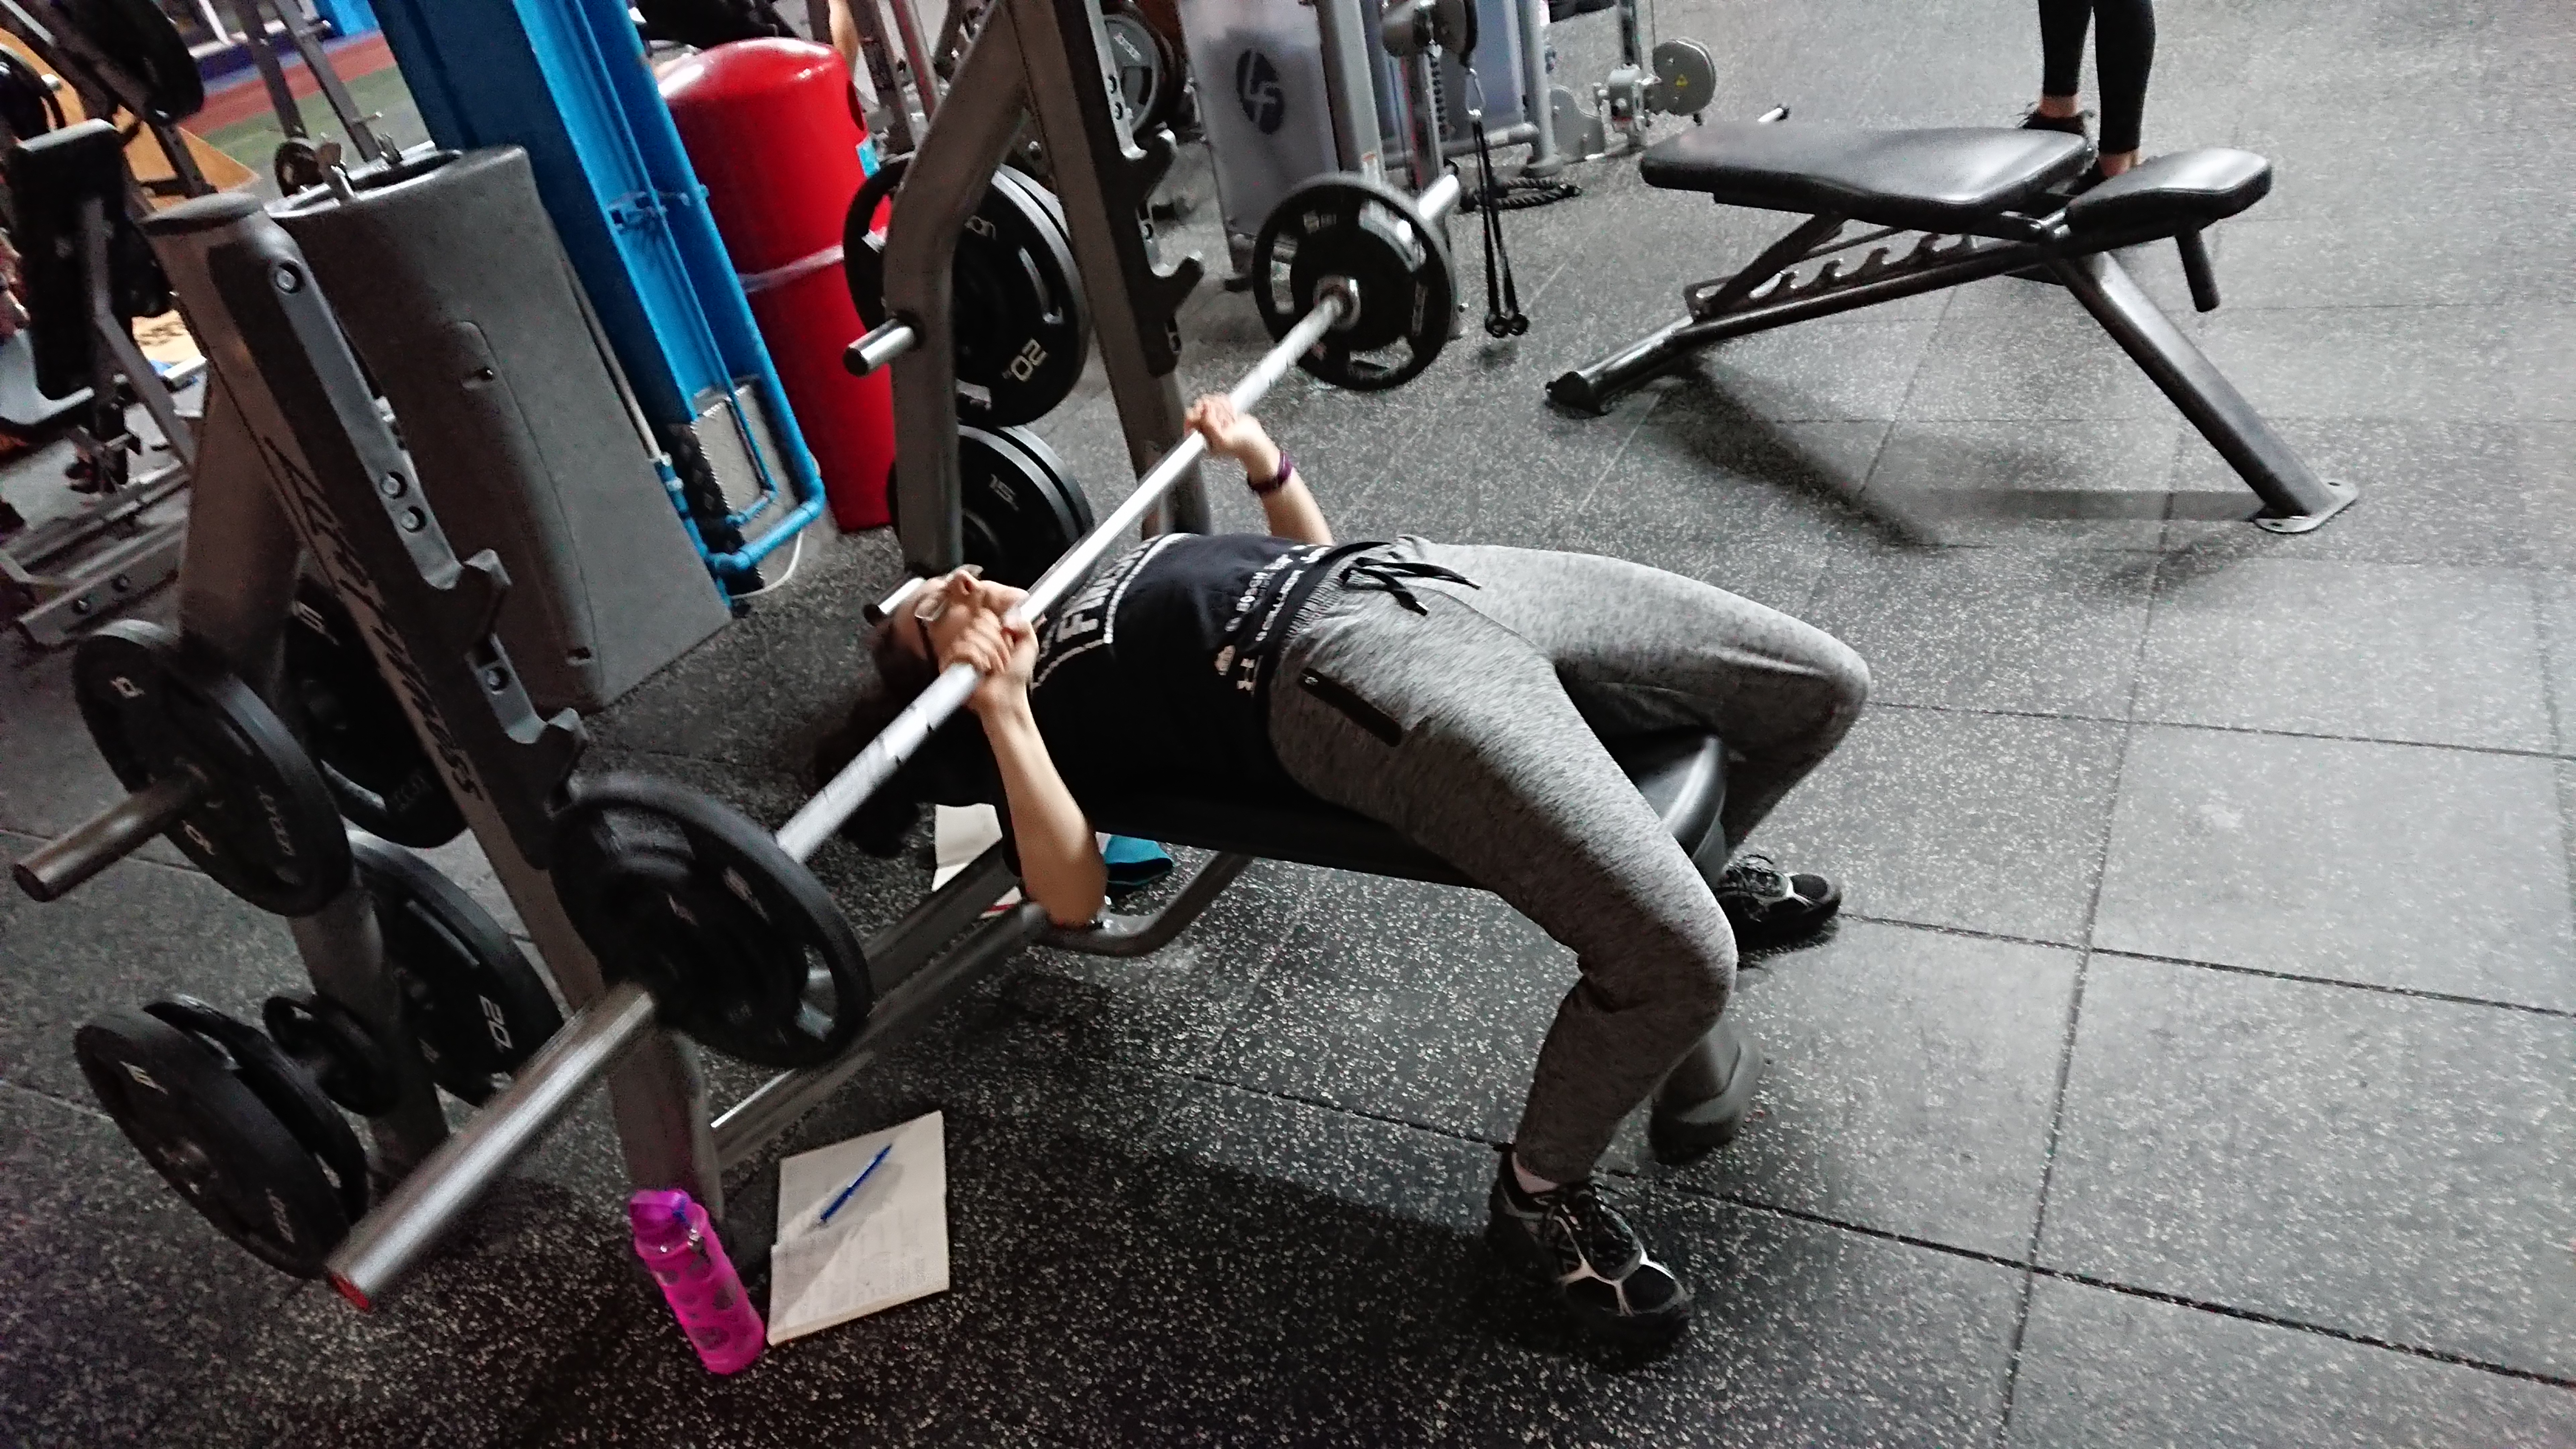 Me, partway through bench pressing 32.5 kg.